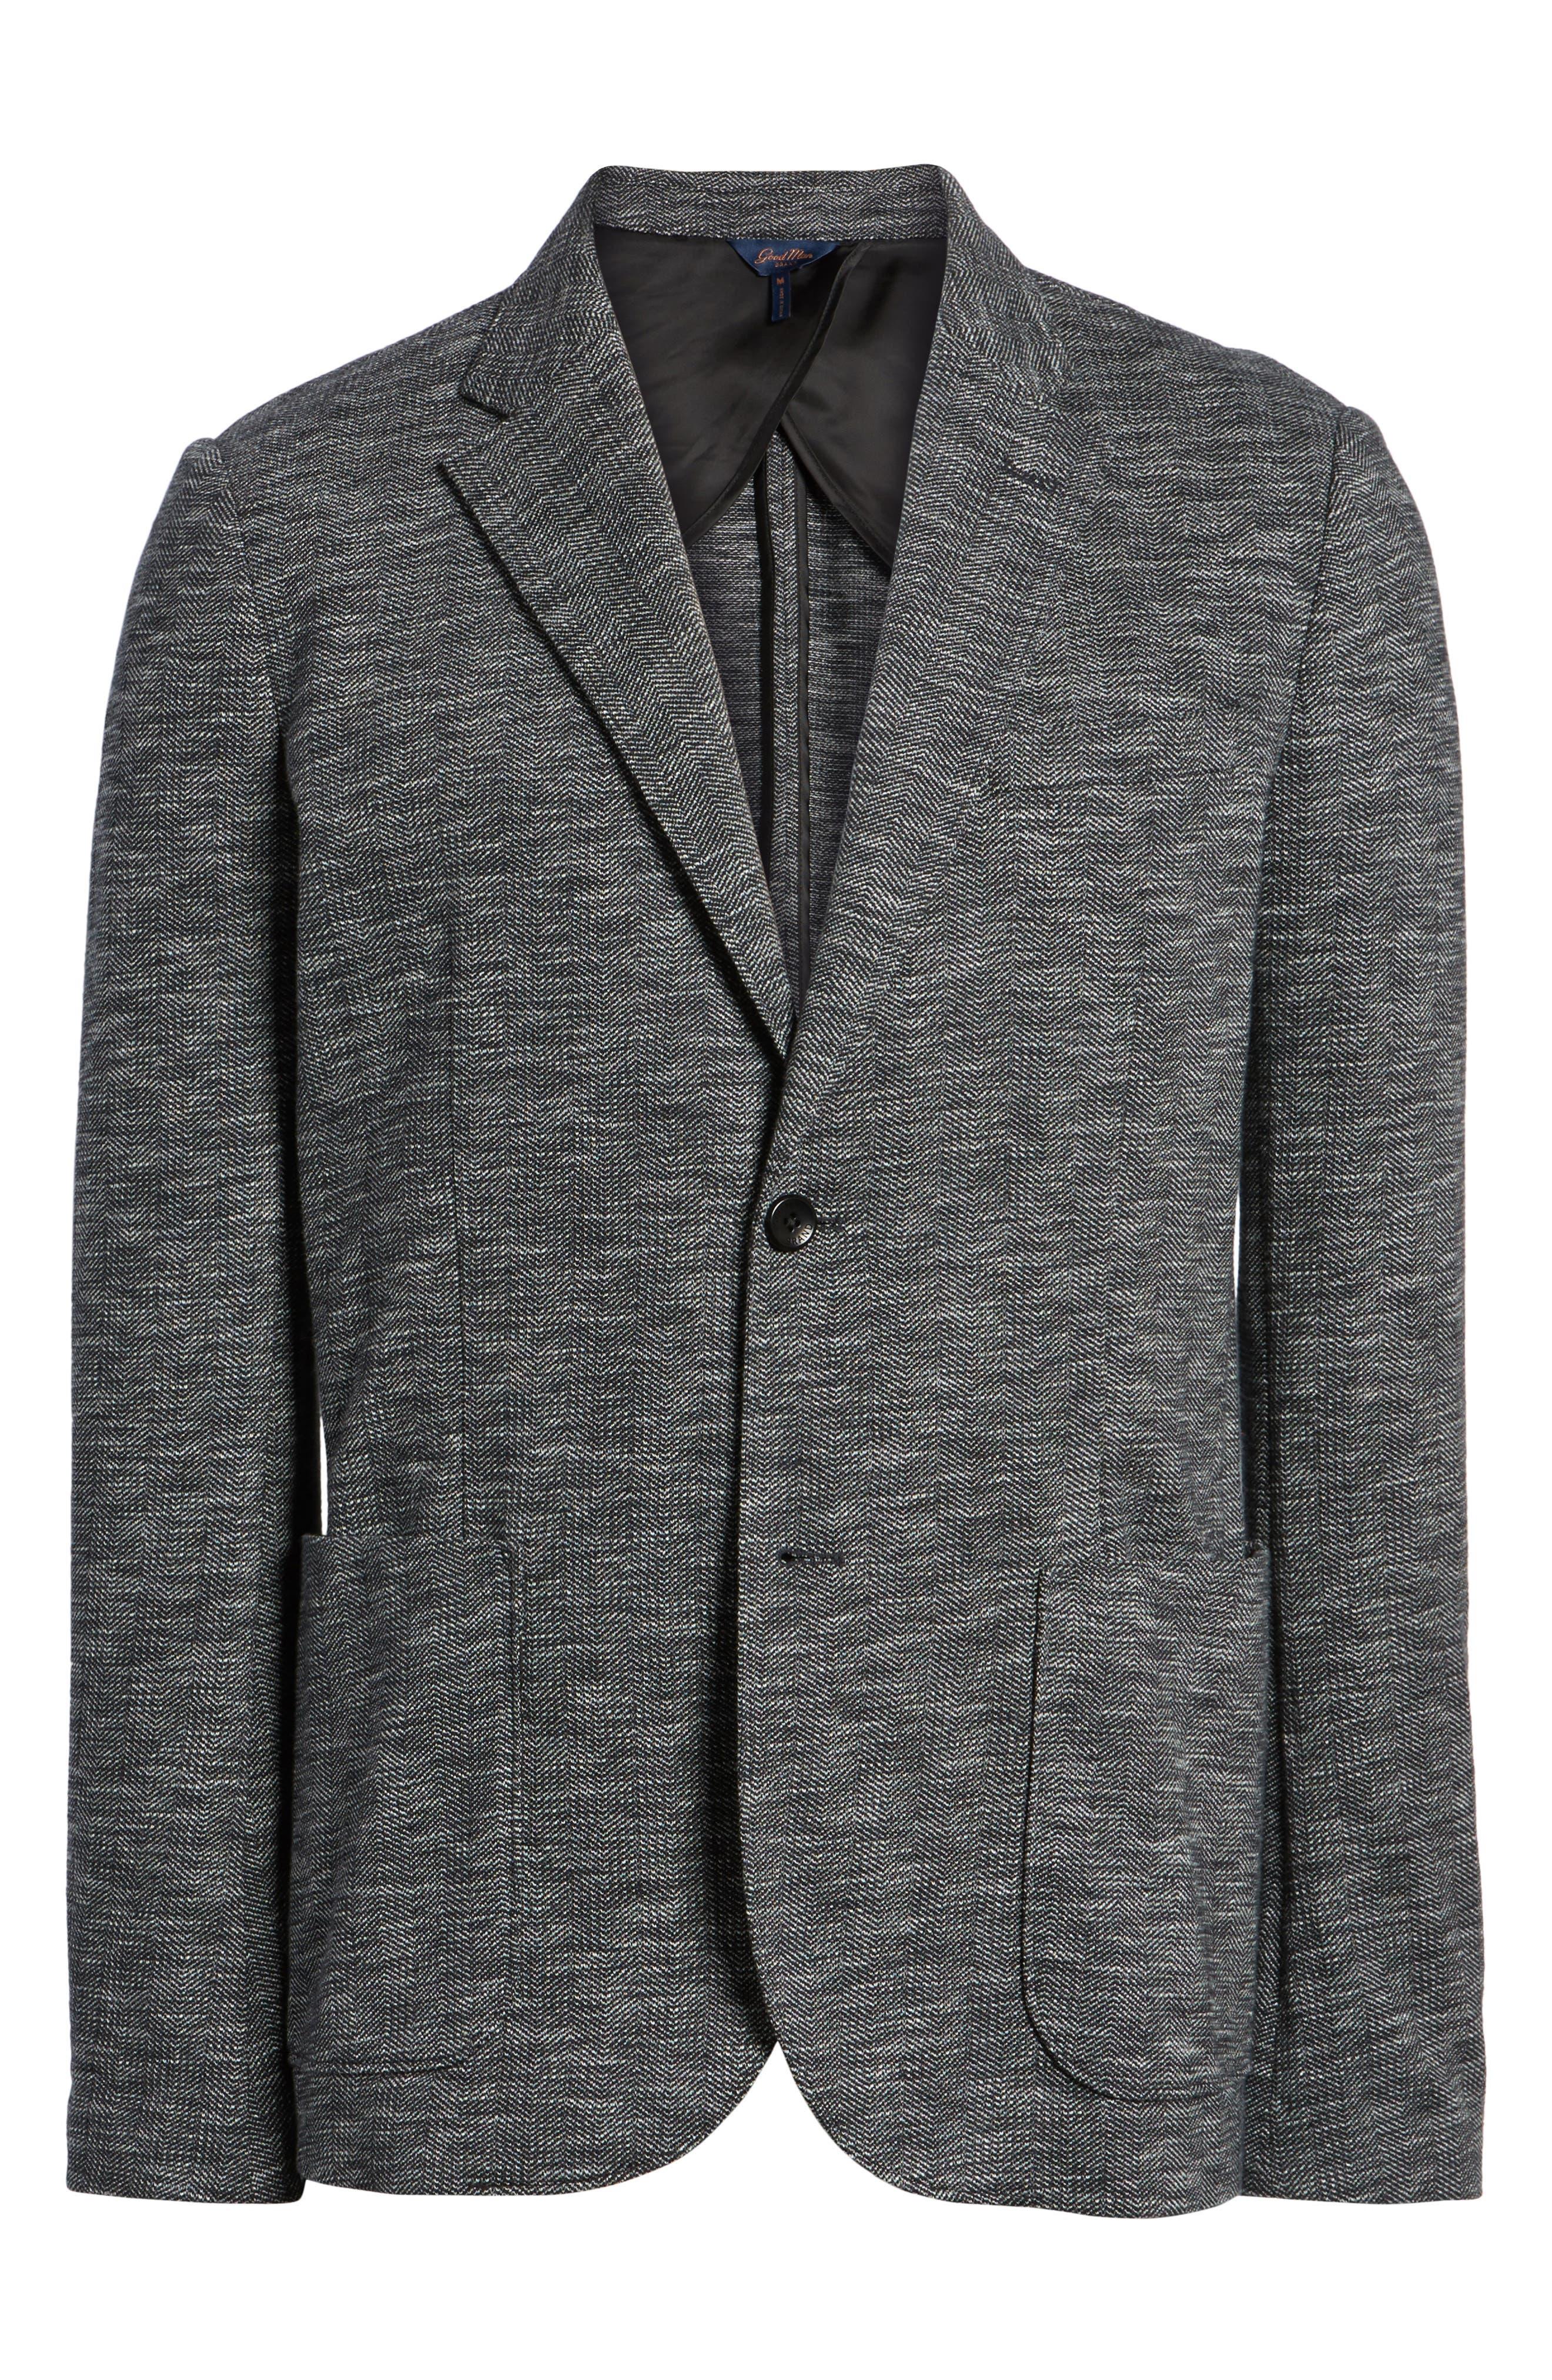 Alternate Image 5  - Good Man Brand Slim Fit Vintage Herringbone Knit Blazer